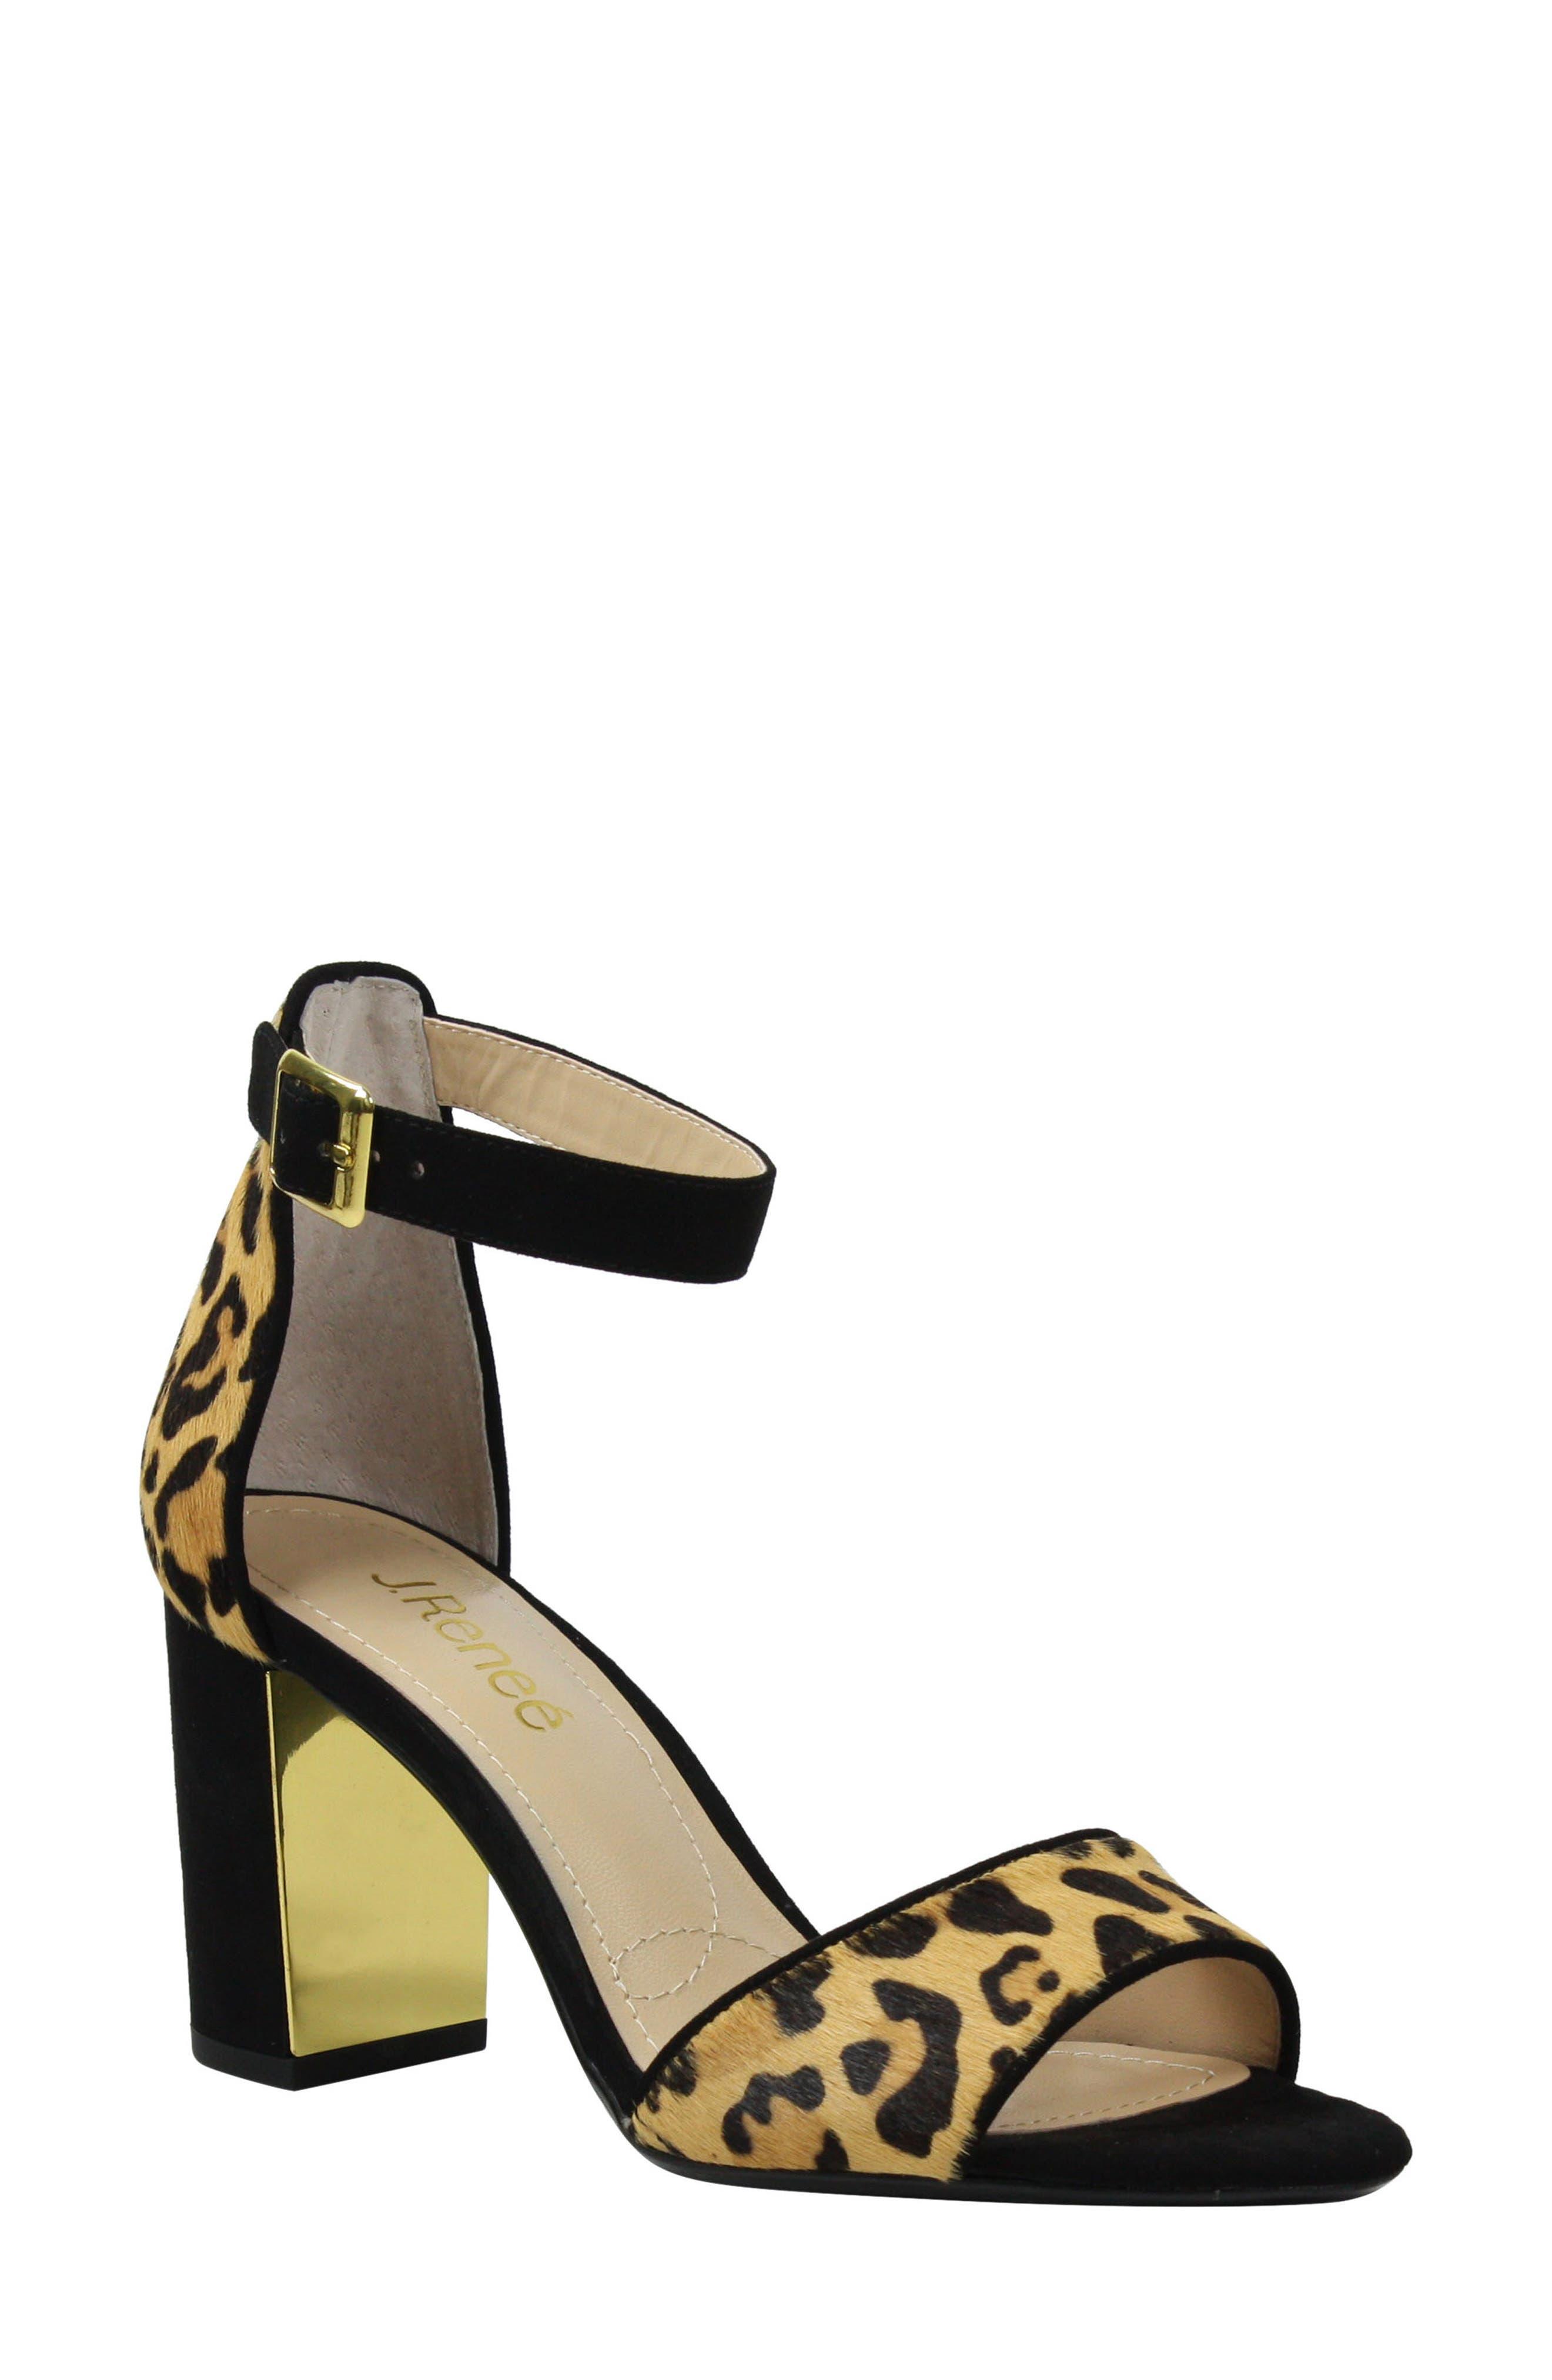 J. RENEÉ, Flaviana Ankle Strap Sandal, Main thumbnail 1, color, BLACK/ BROWN CALF HAIR